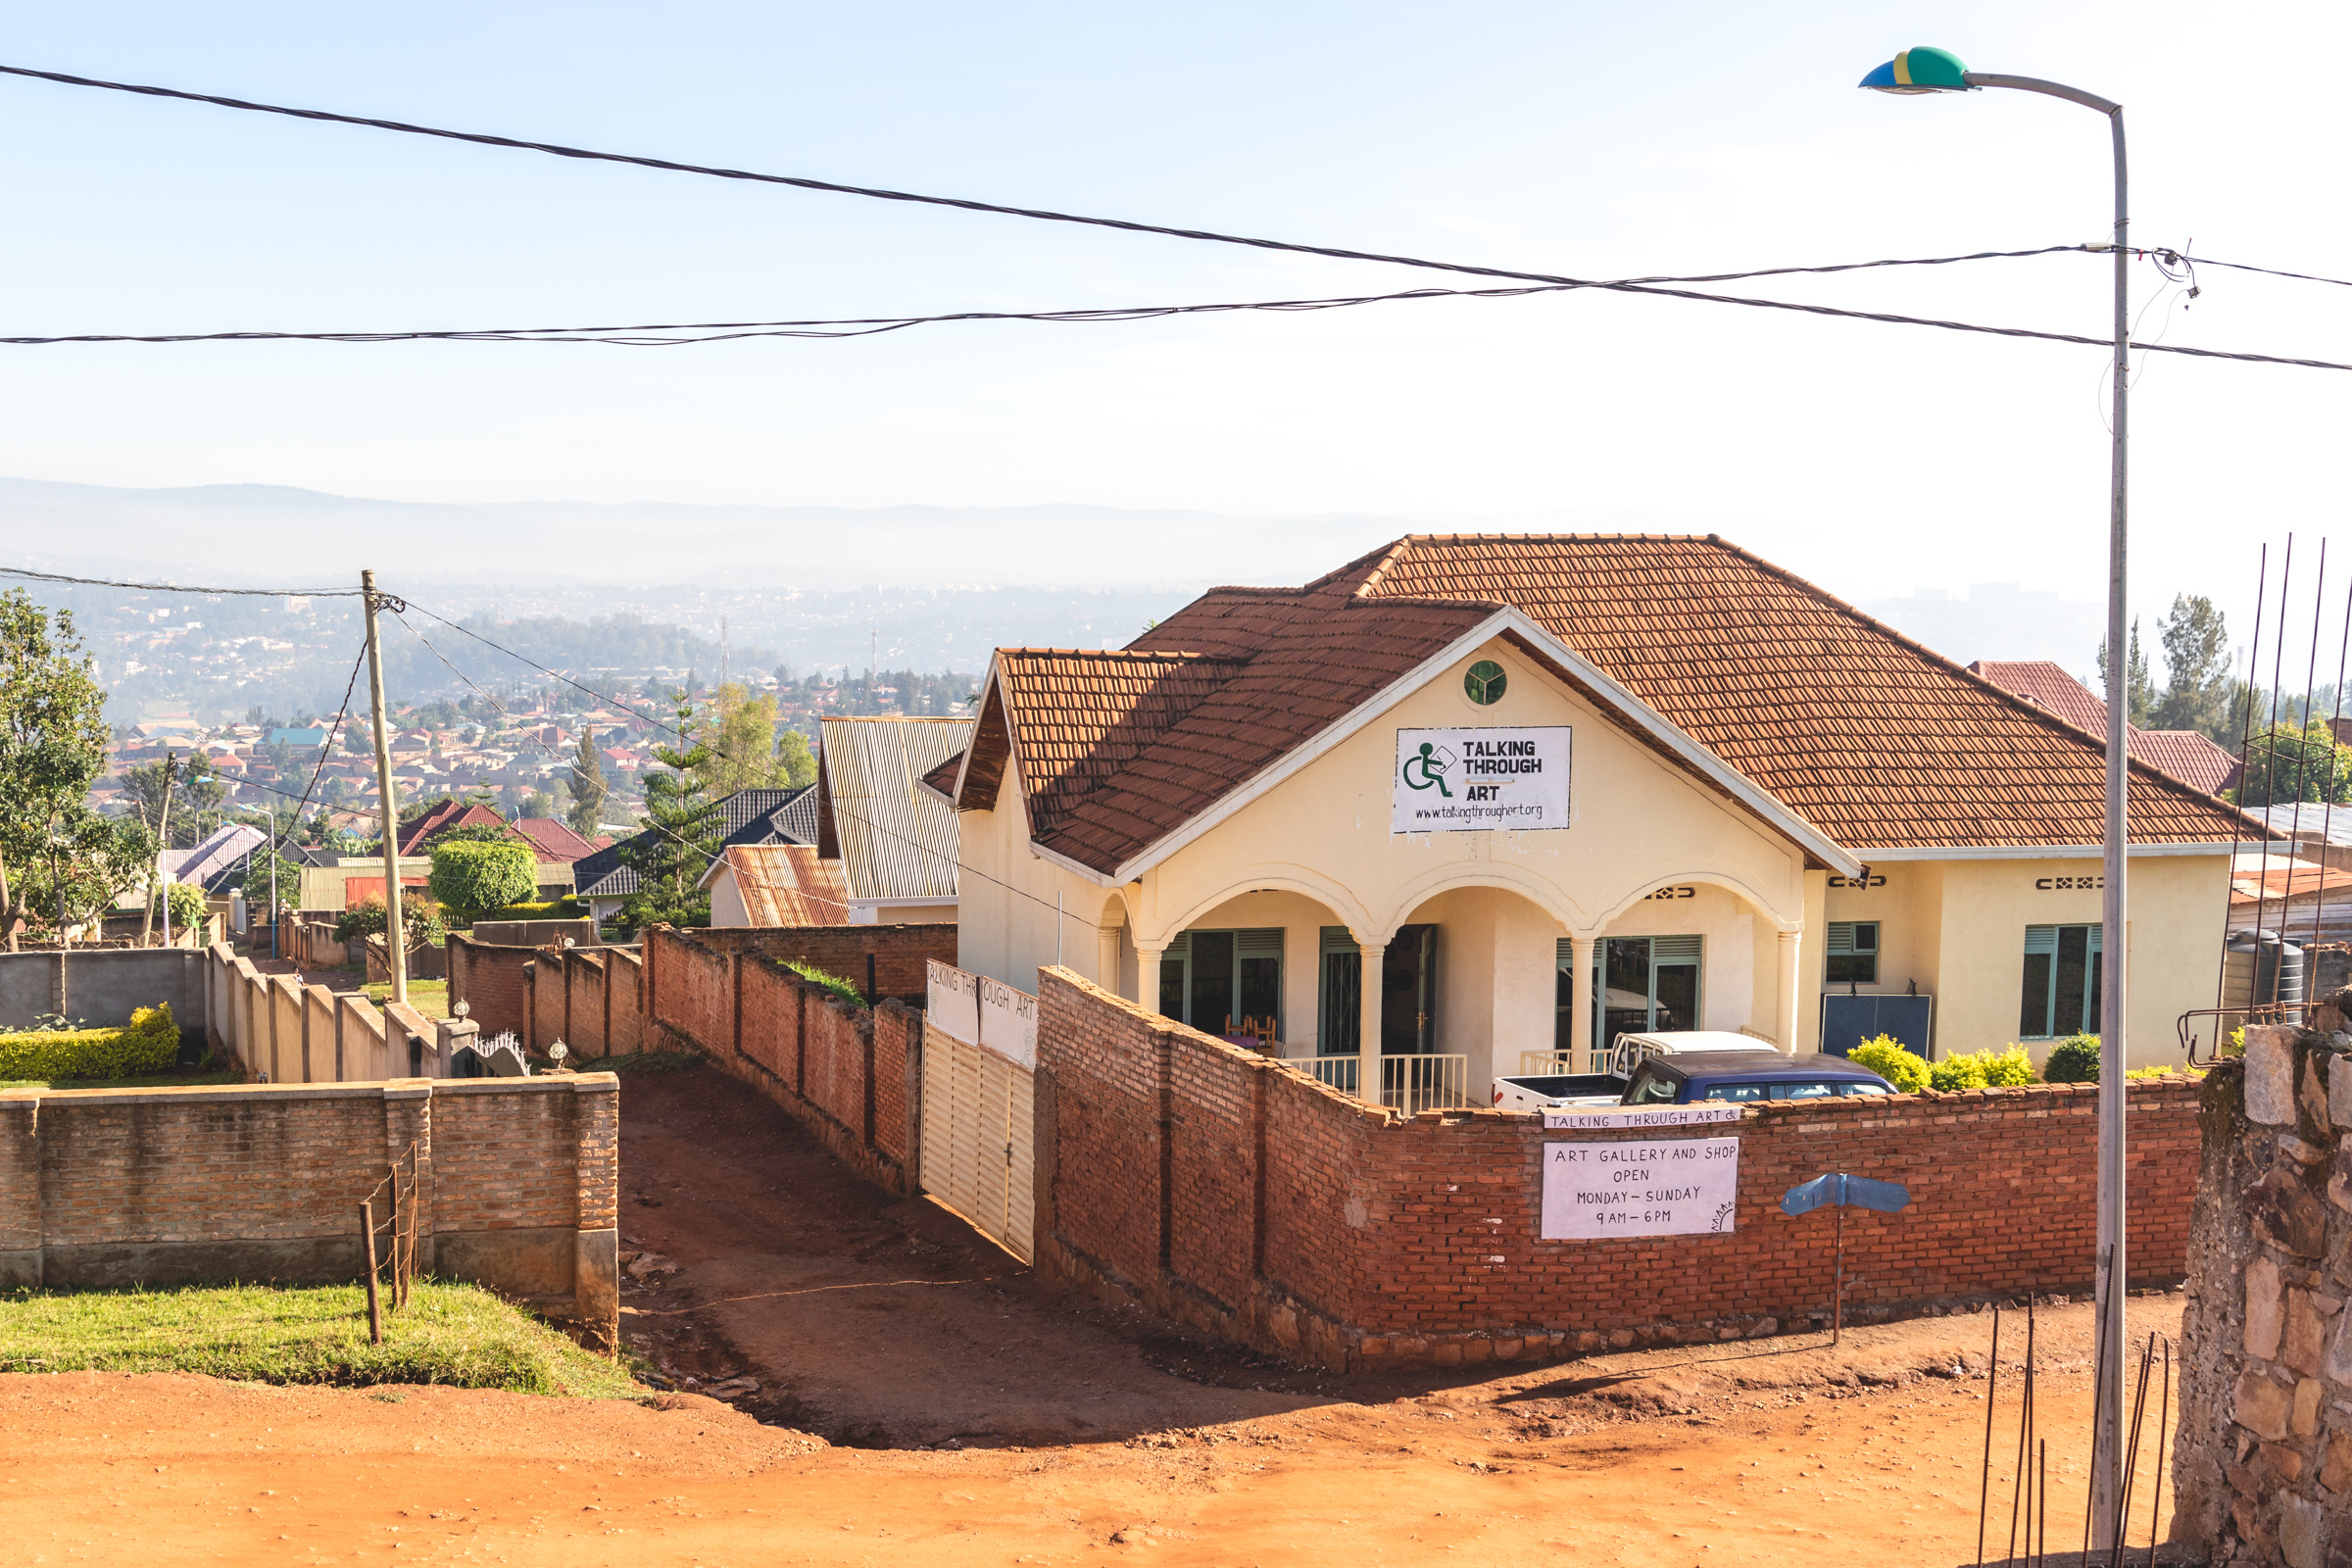 talking through art ngo headquarters in kigali